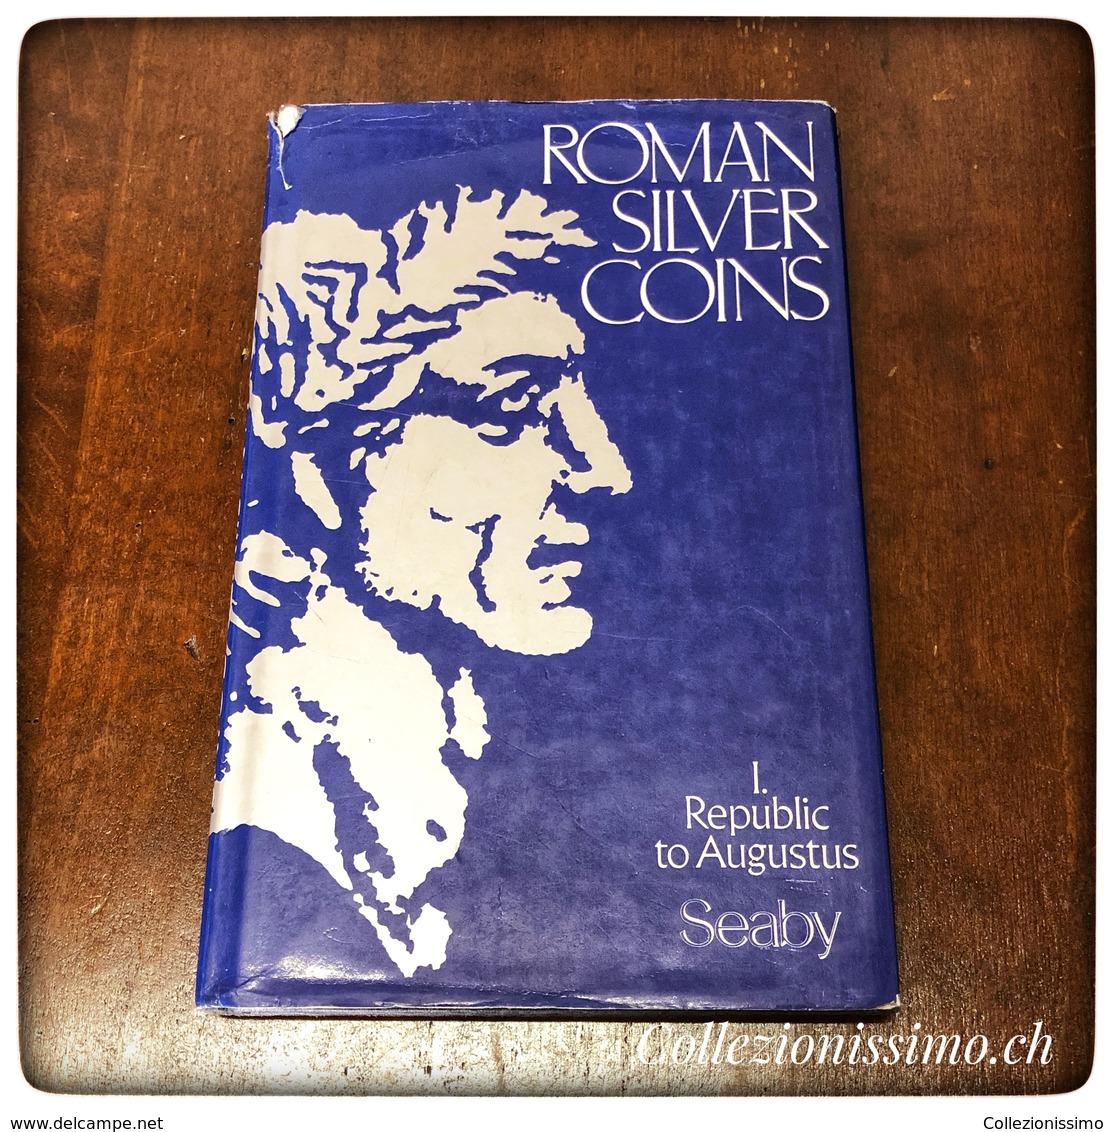 Roman Silver Coins H. A. Seaby – Vol. 1 - Boeken & Software